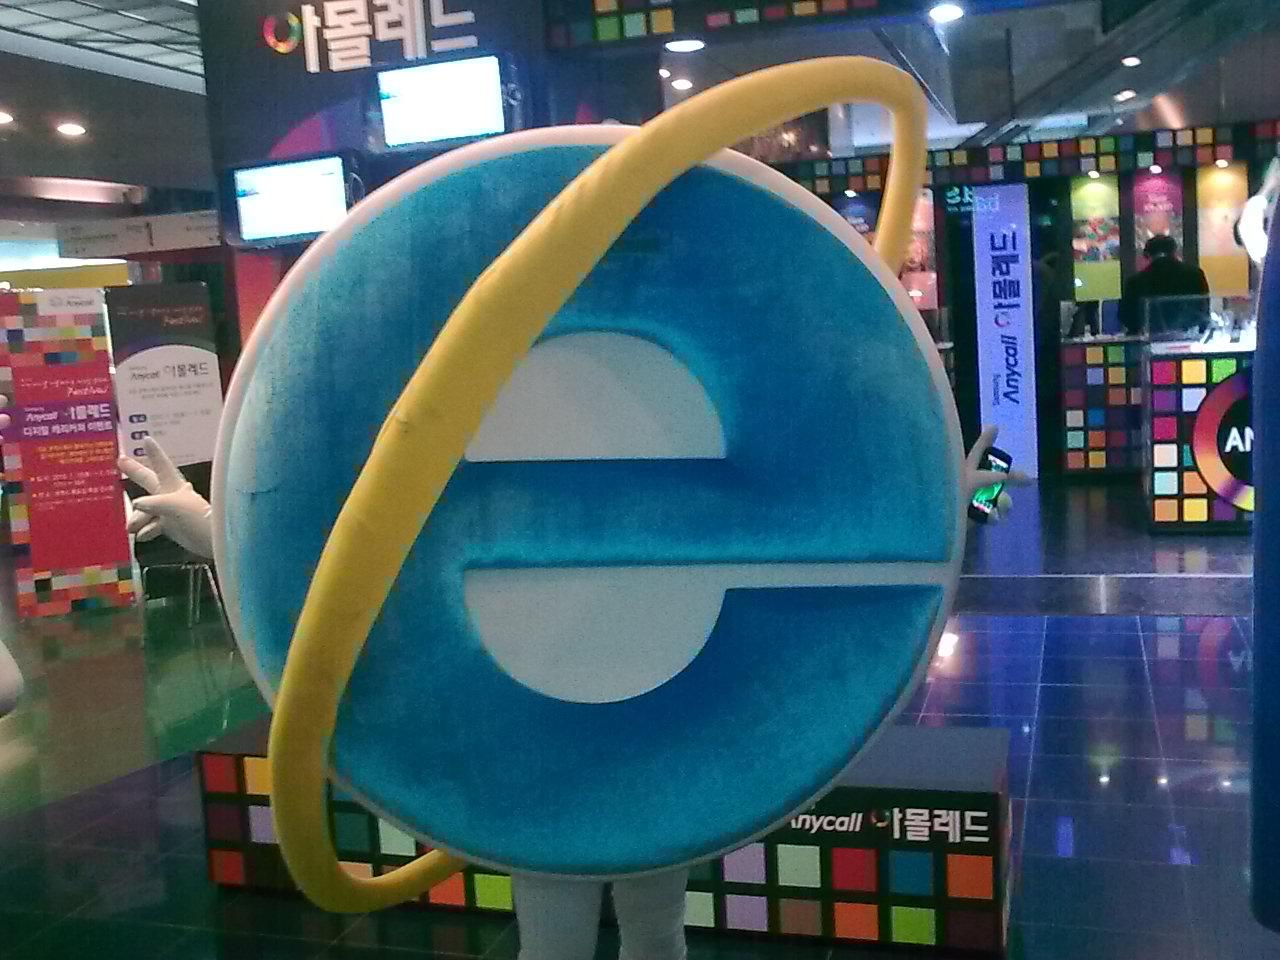 Internet Explorer mascot